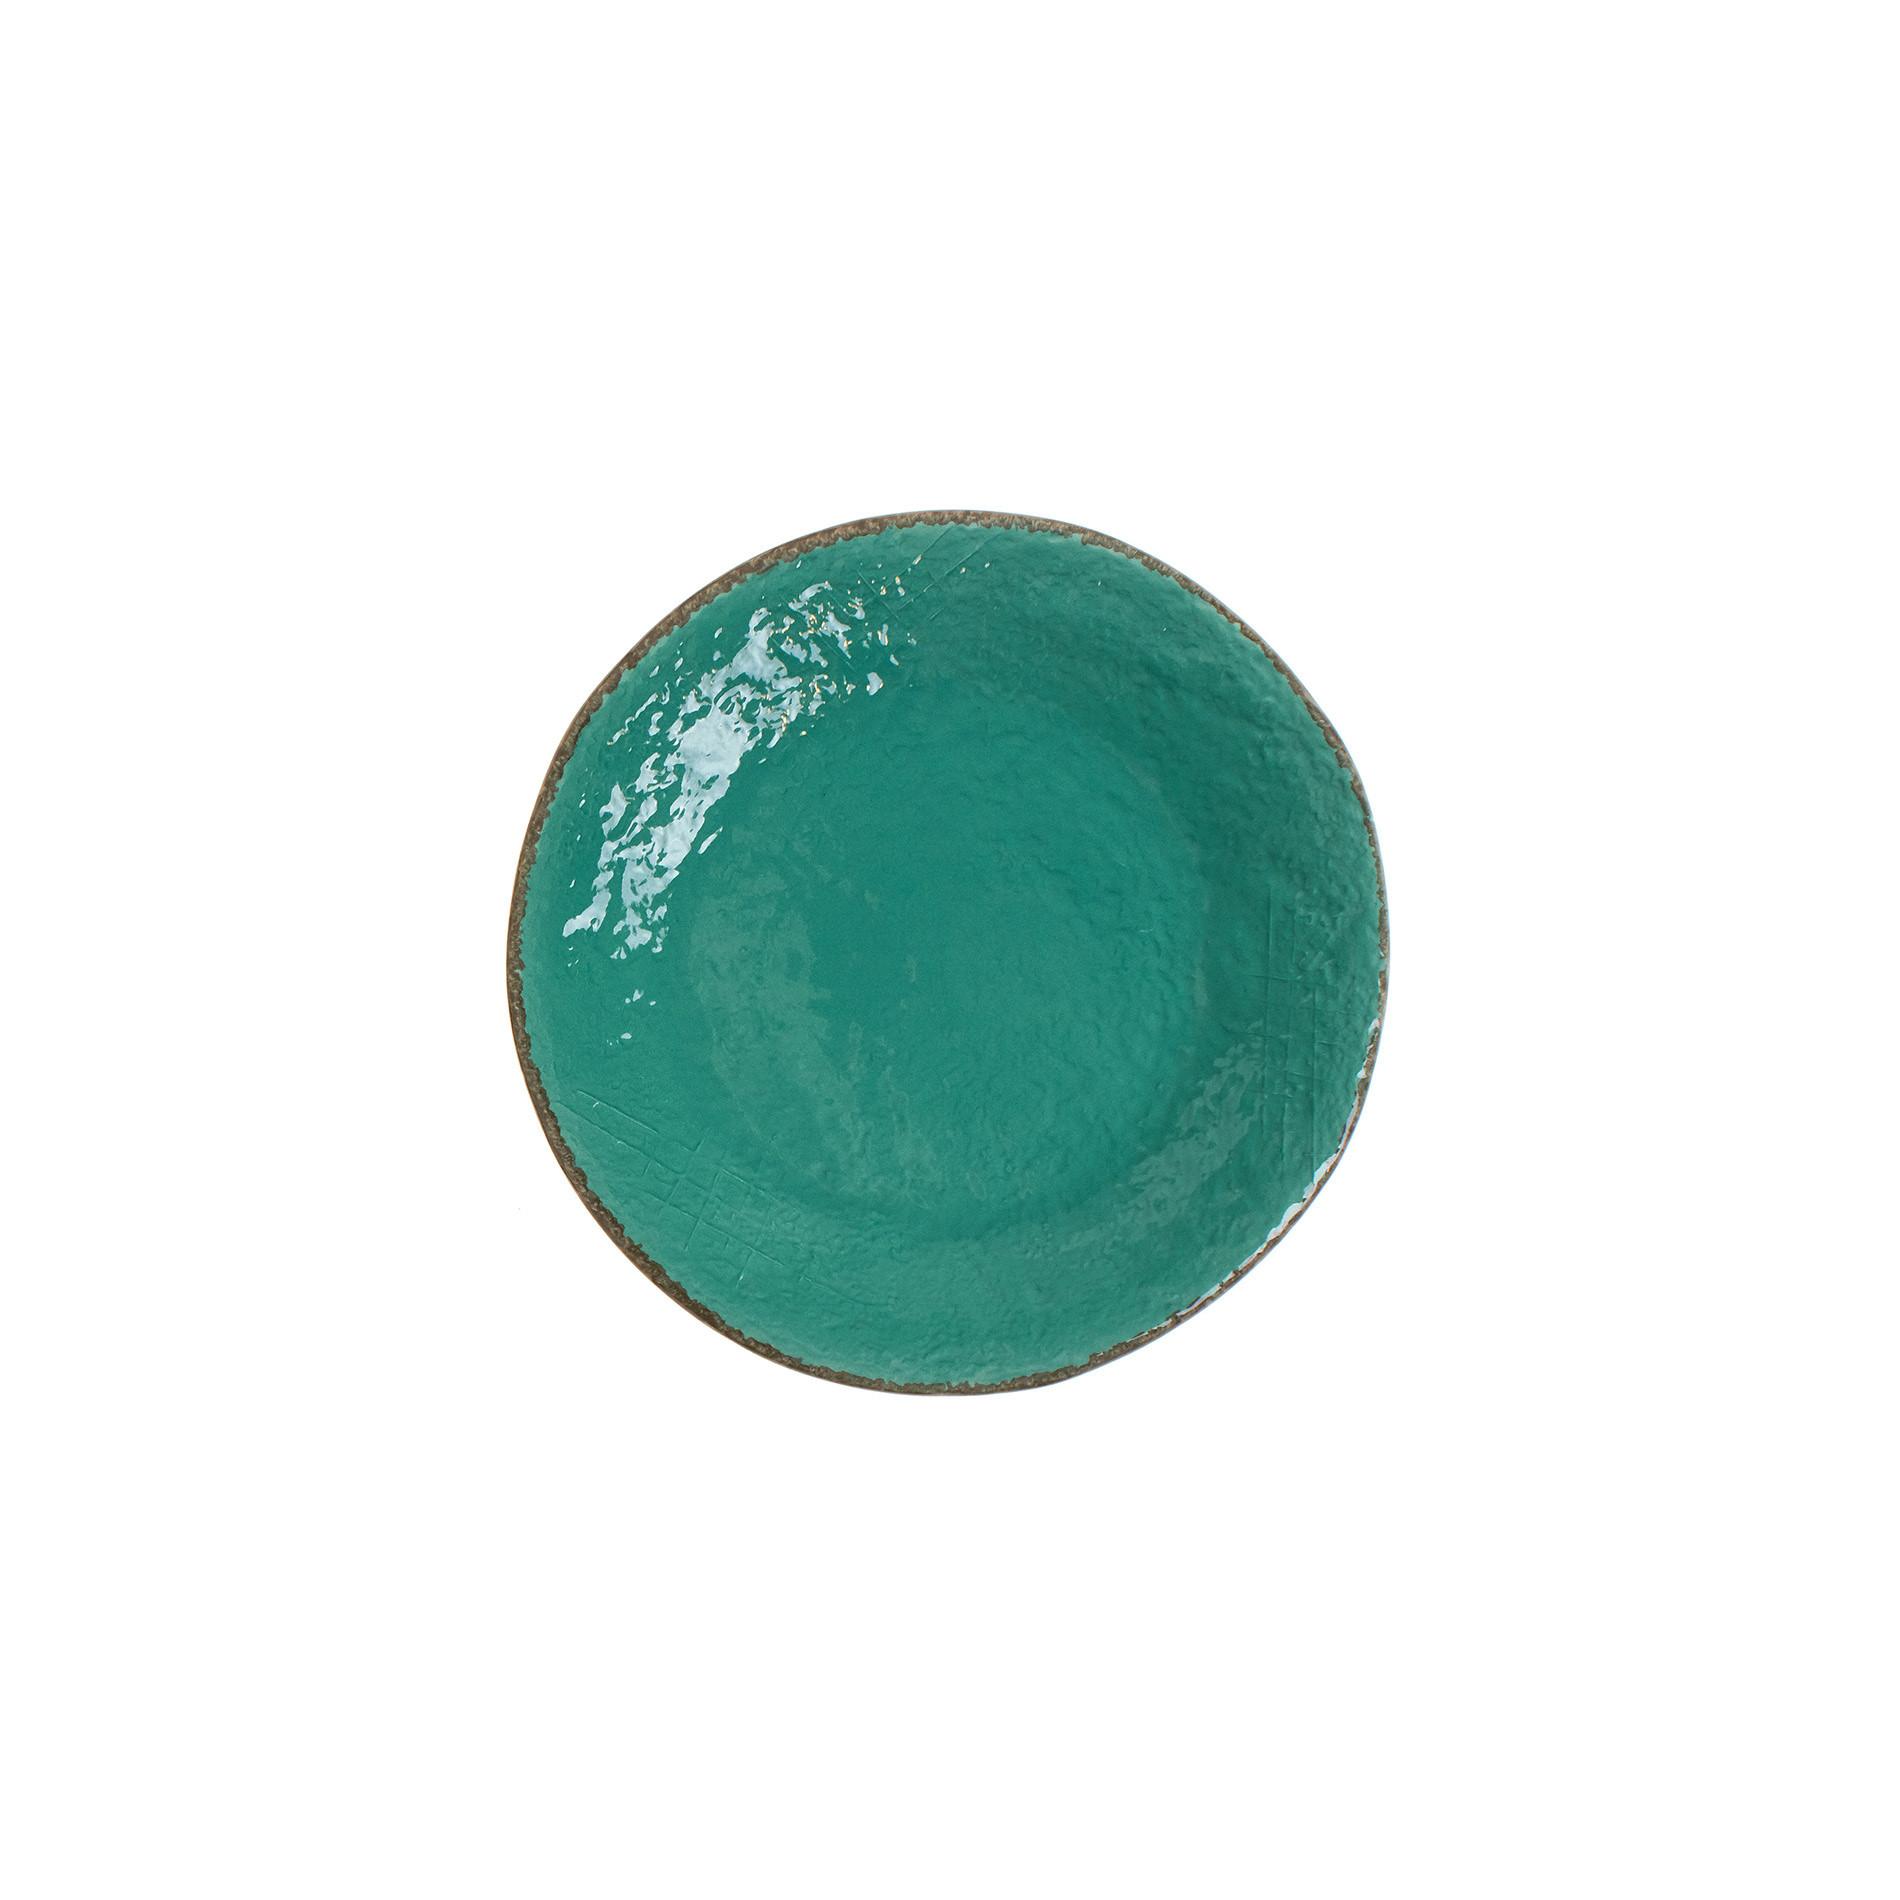 Piatto frutta ceramica artigianale Preta, Verde acqua, large image number 0